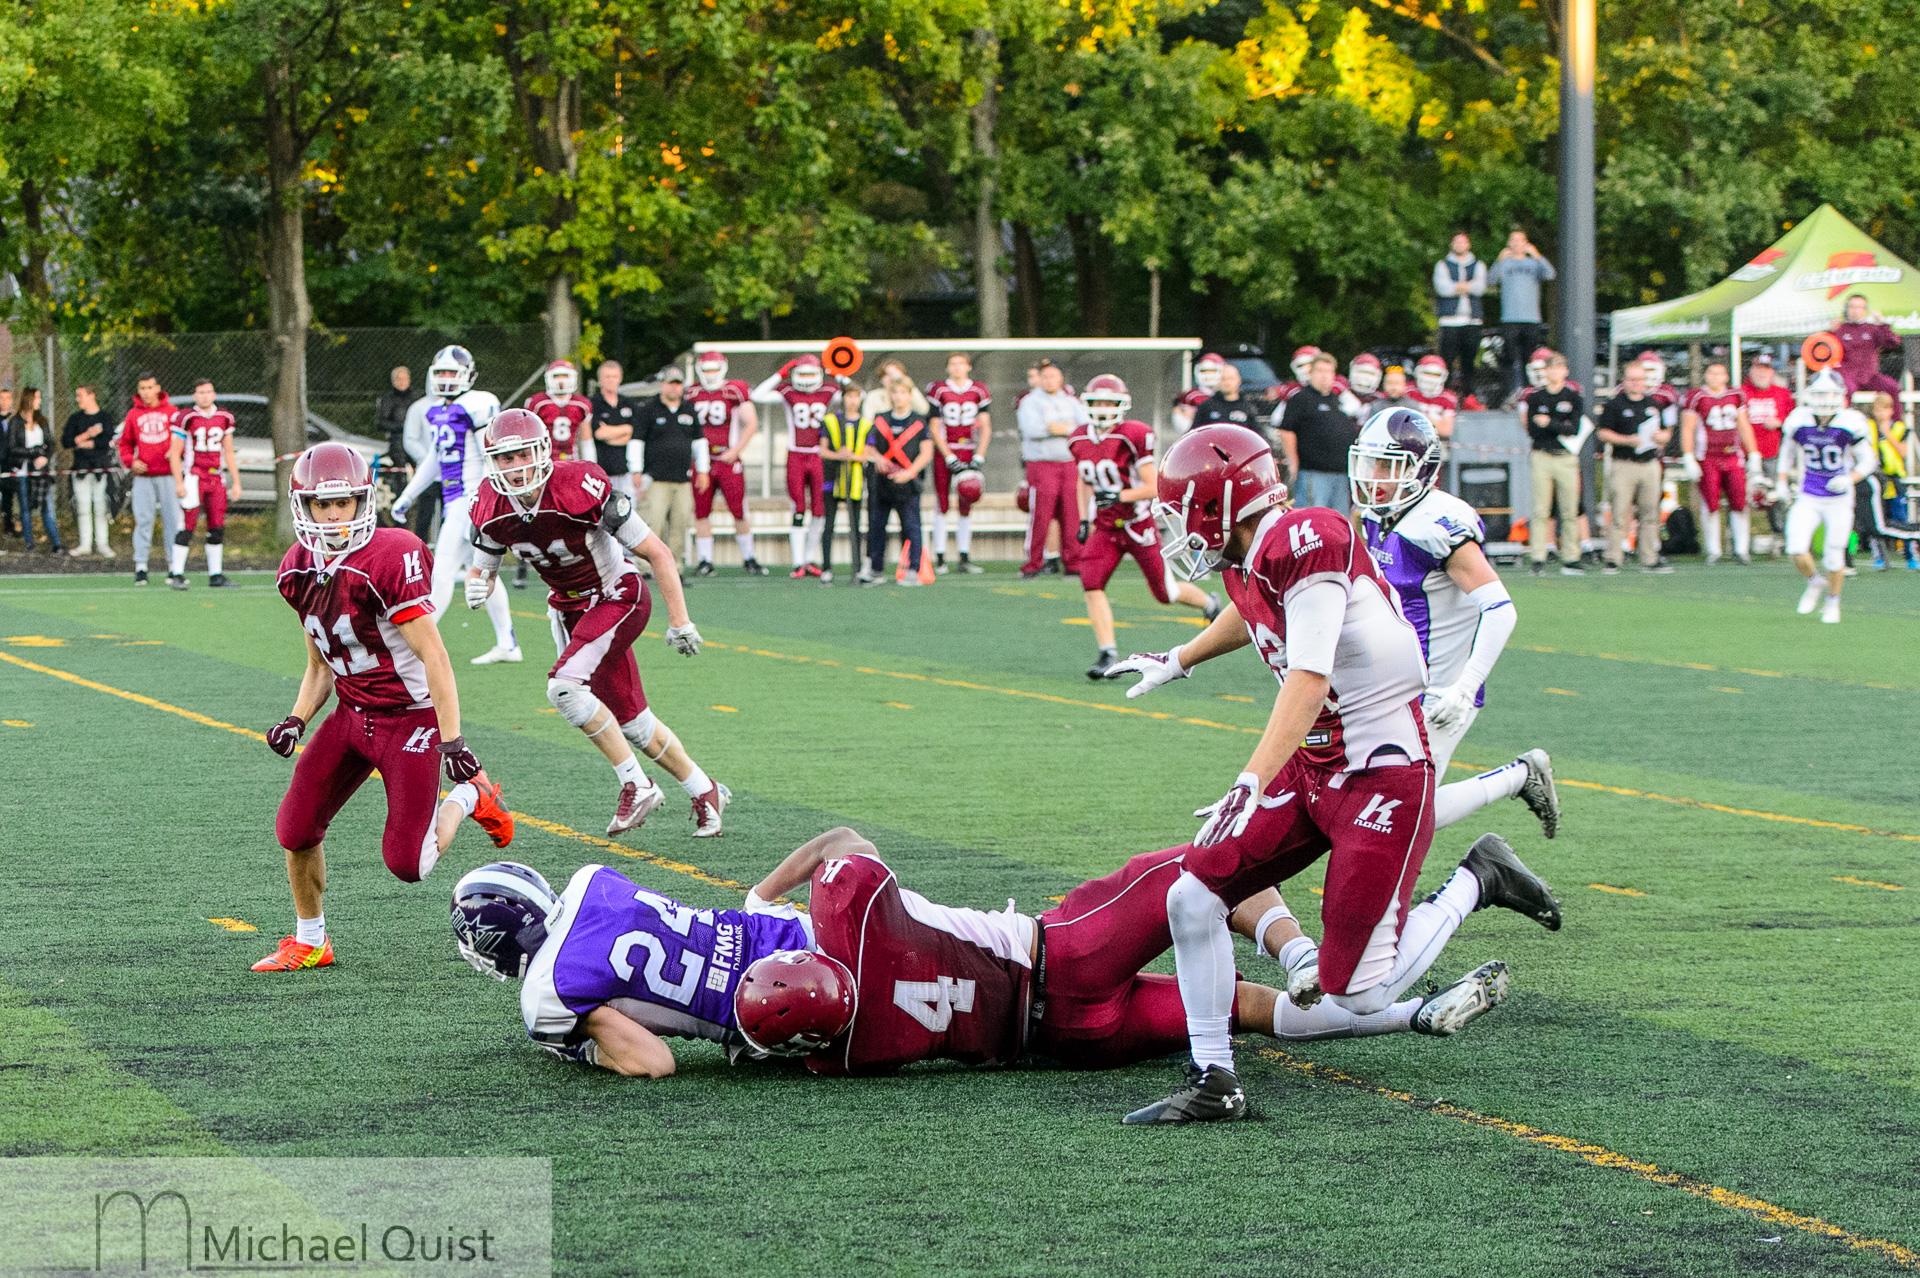 Junior-Bowl-2015-Copenhagen-Towers-vs-Herlev-Rebels-113